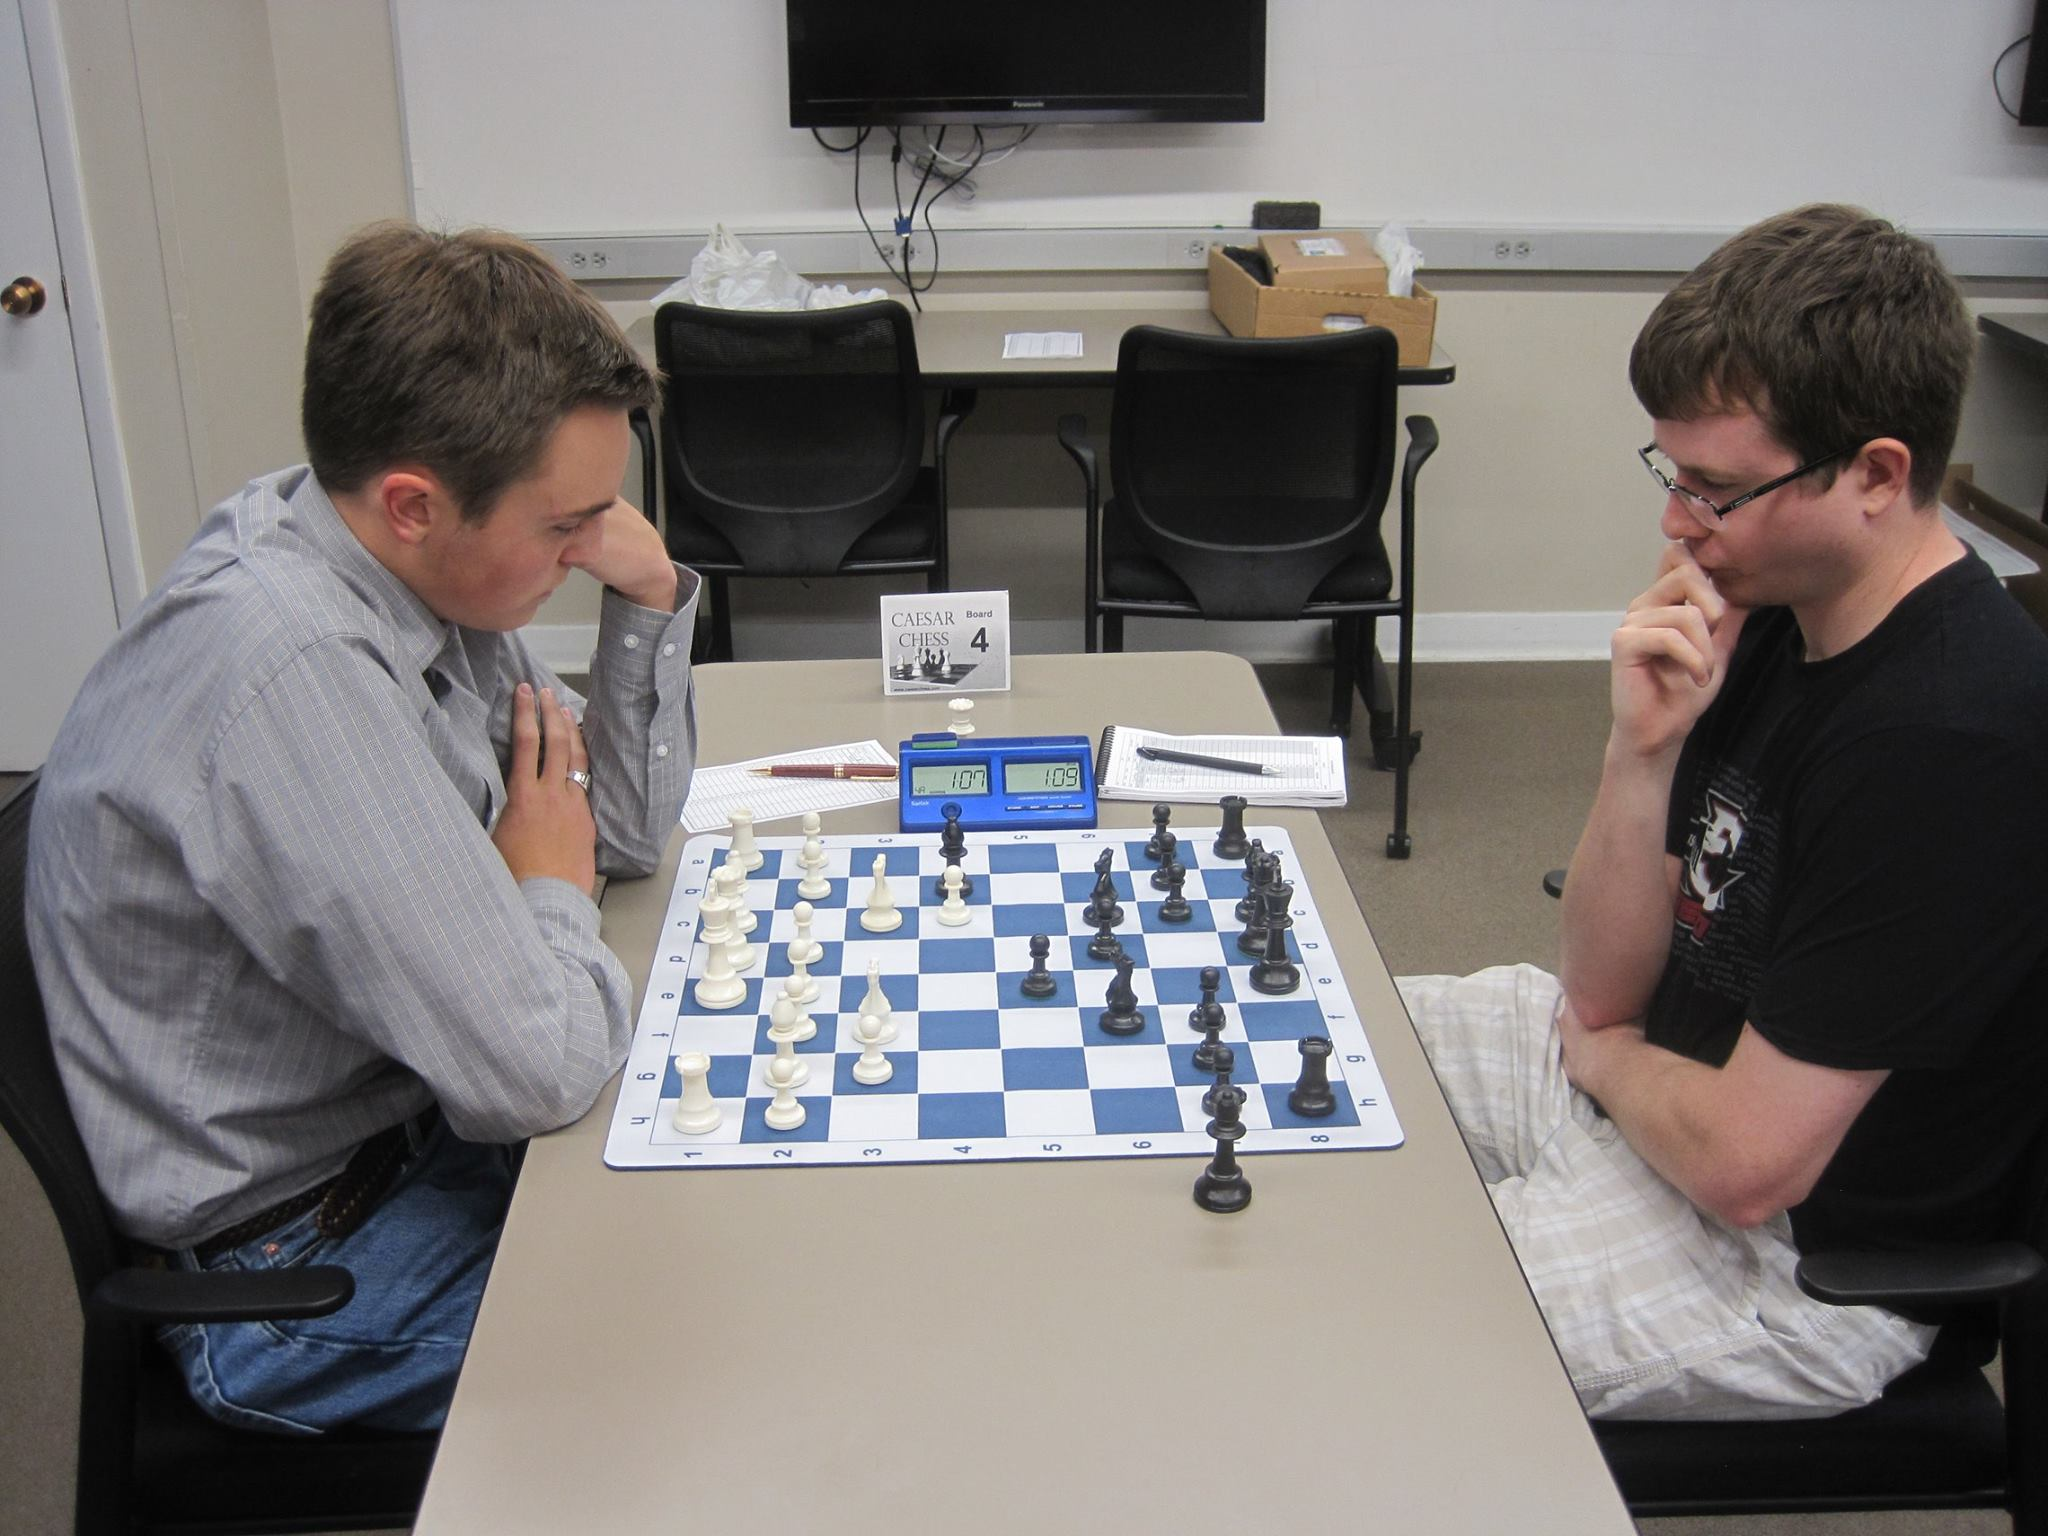 Flashback to 2016: Jonathan Rasberry (Left) Starts his Successful tournament against Chris Trees. Photo CRedit: Scott Varagona (2016)